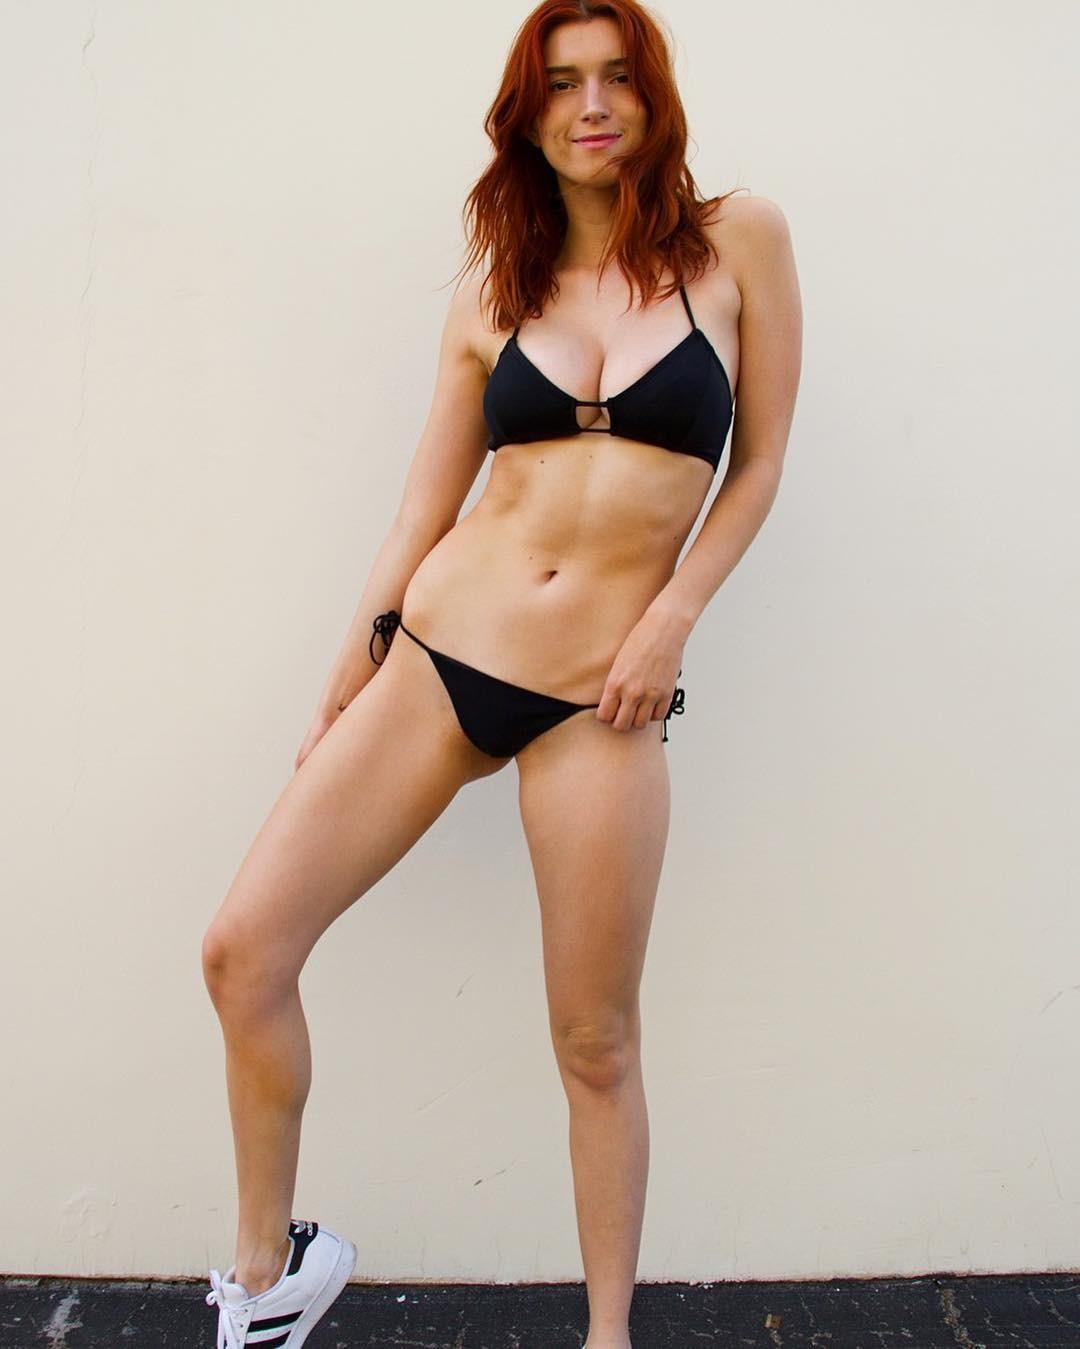 Bella thorne gq lingerie photoshoot